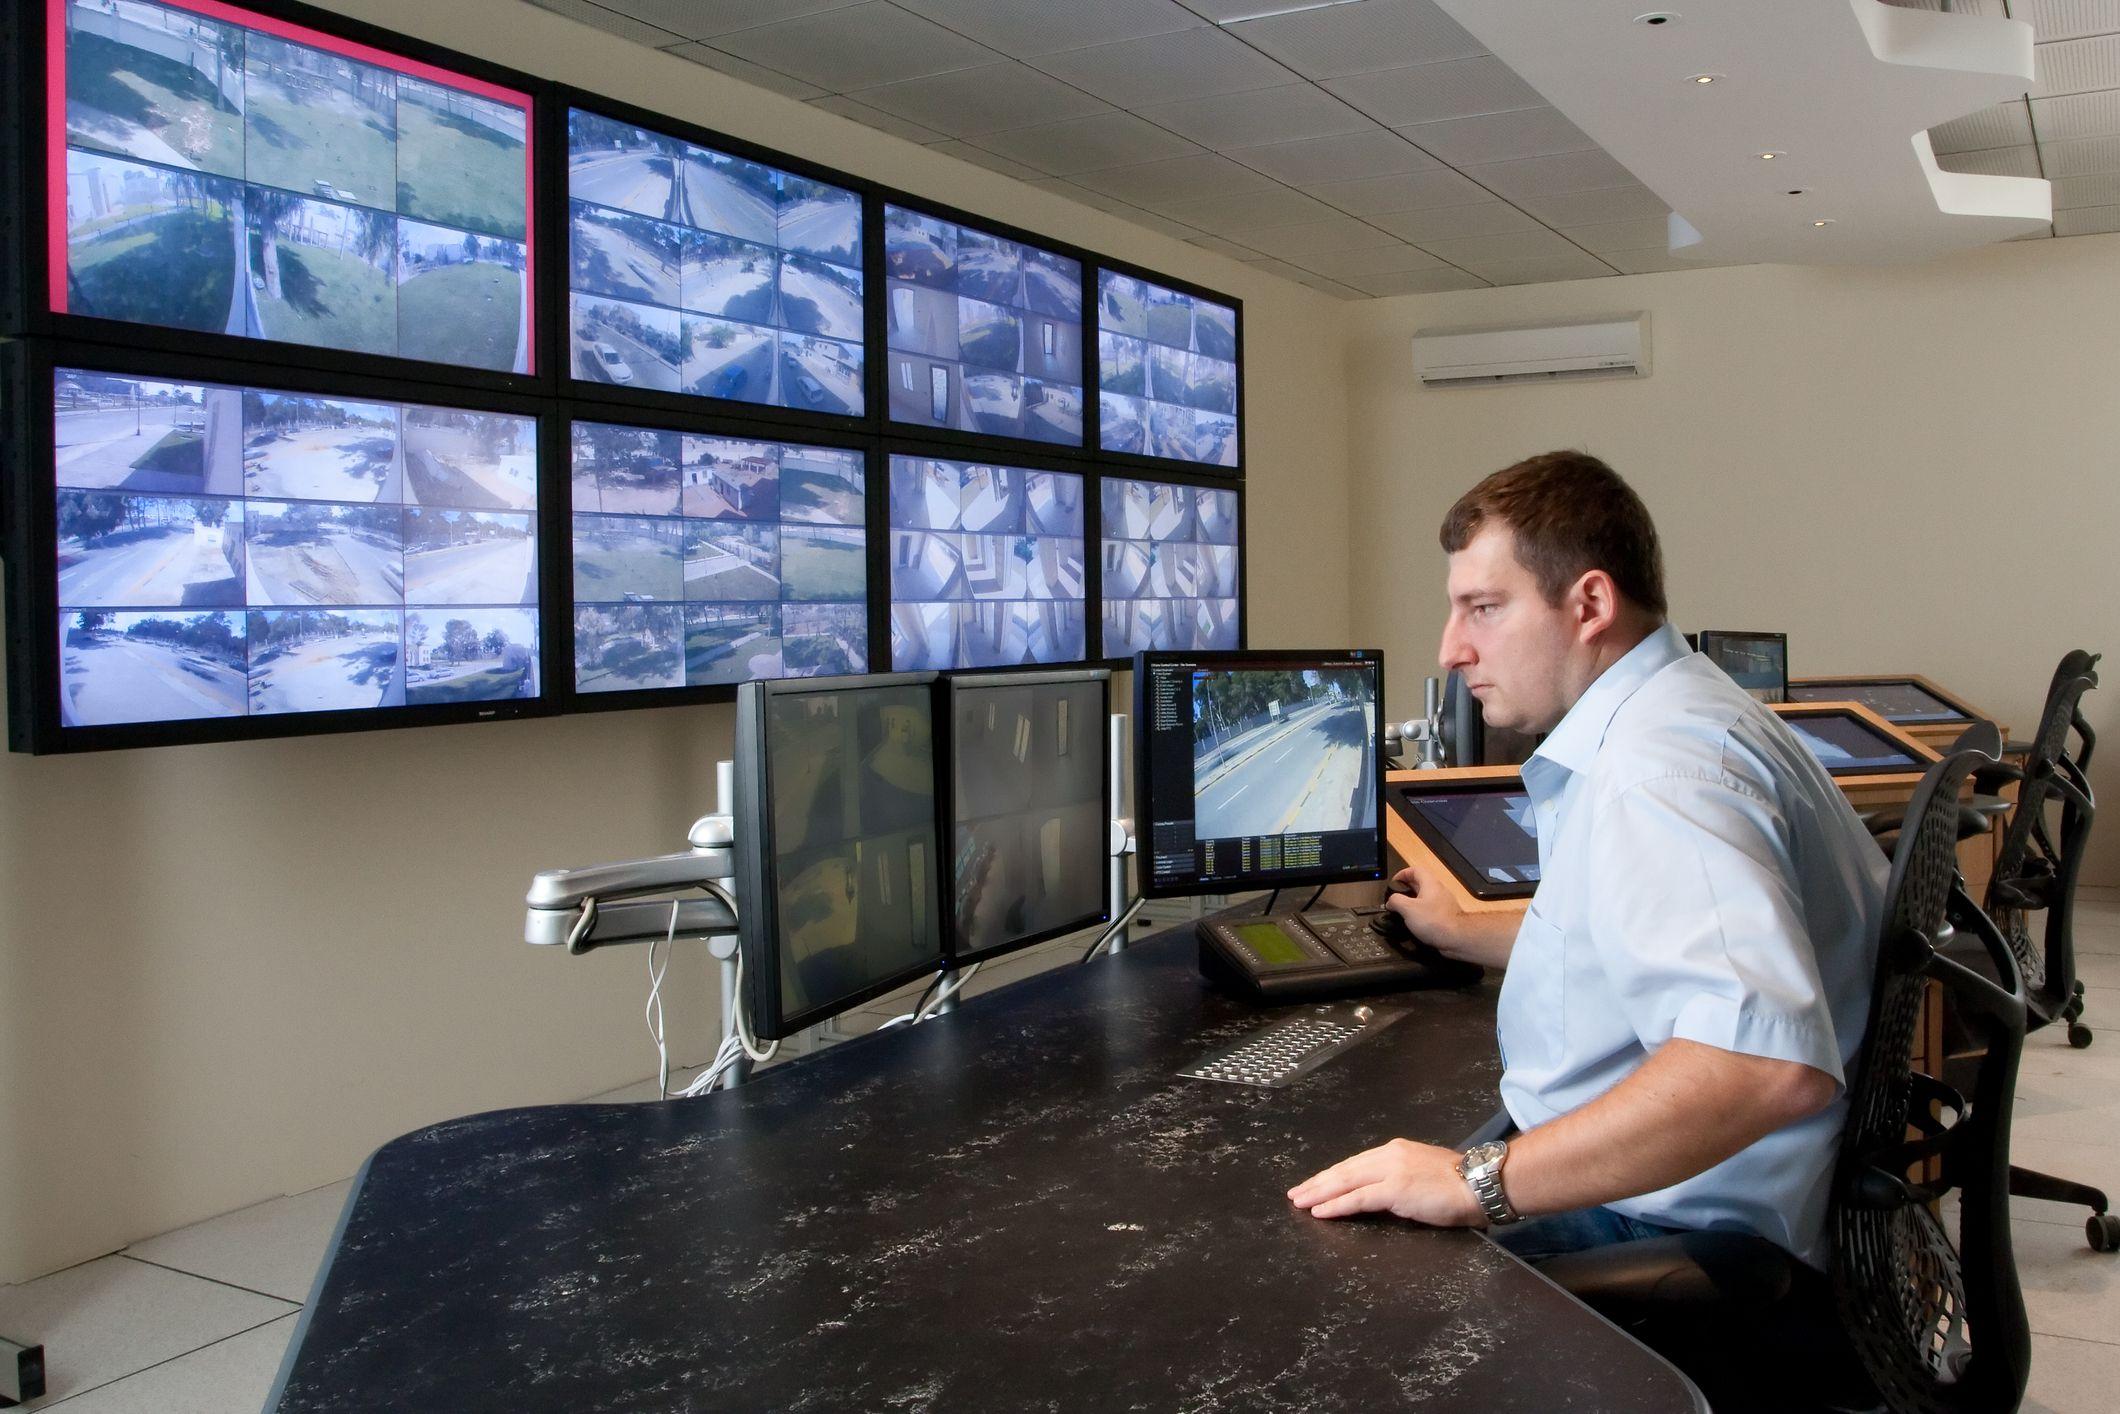 Surveillance Camera Control Systems